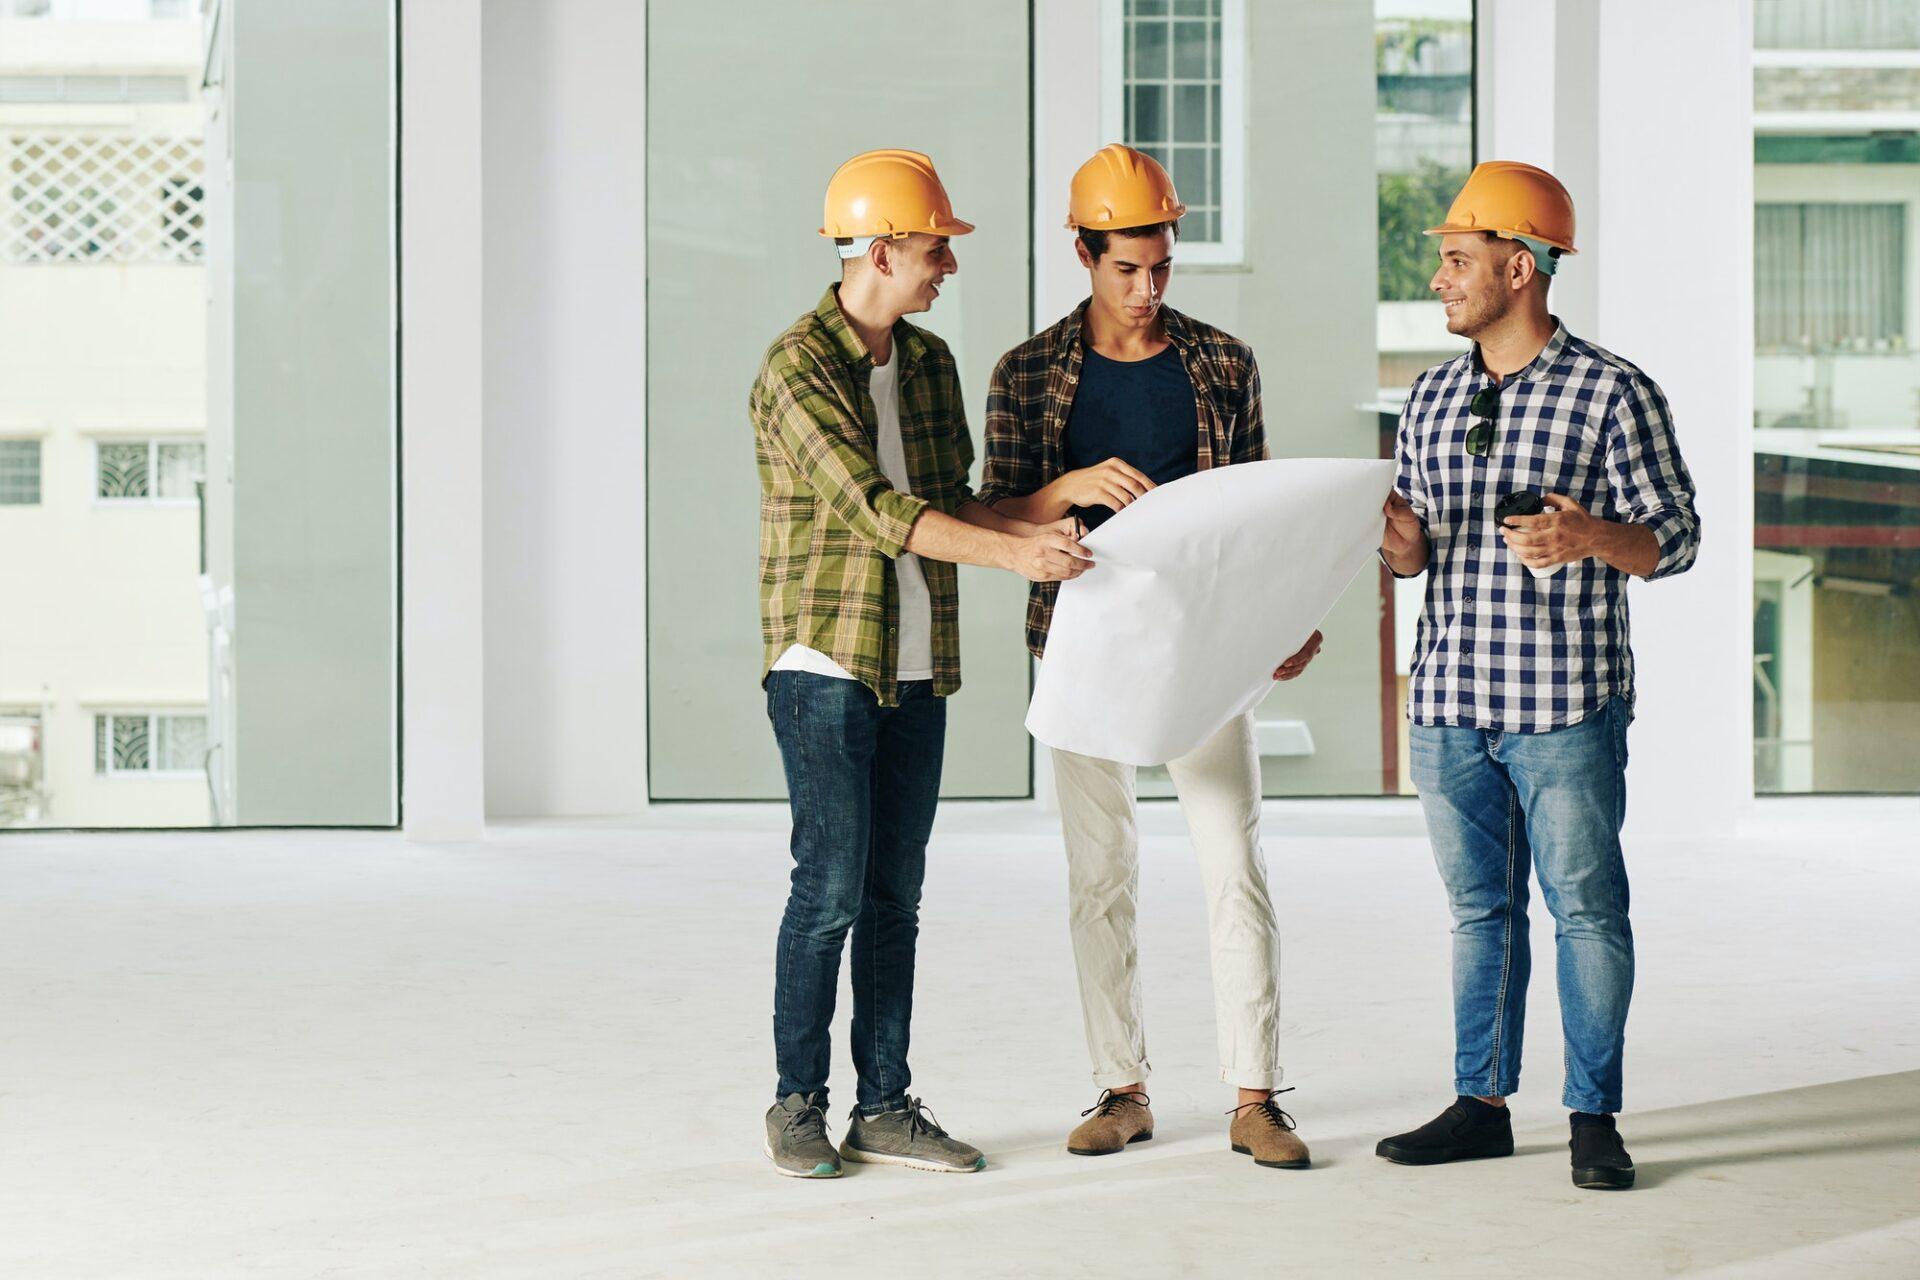 Contractors discussing plan